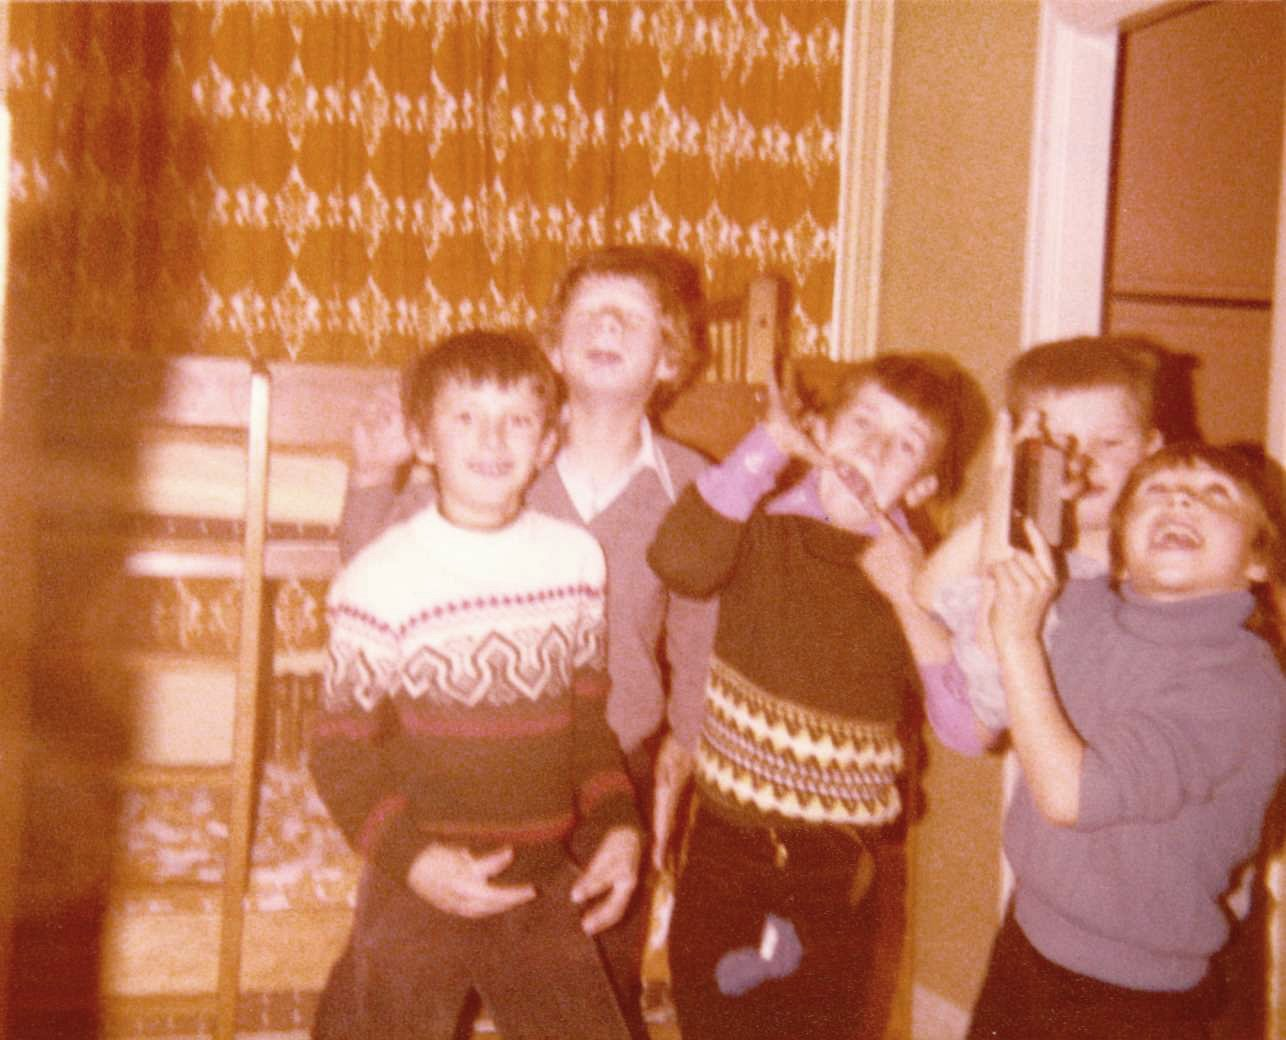 c. 1980 Barnes Close. ? Stillman, Simon Day, Danny Hazell, Simon Coombes and Darren Wickham.